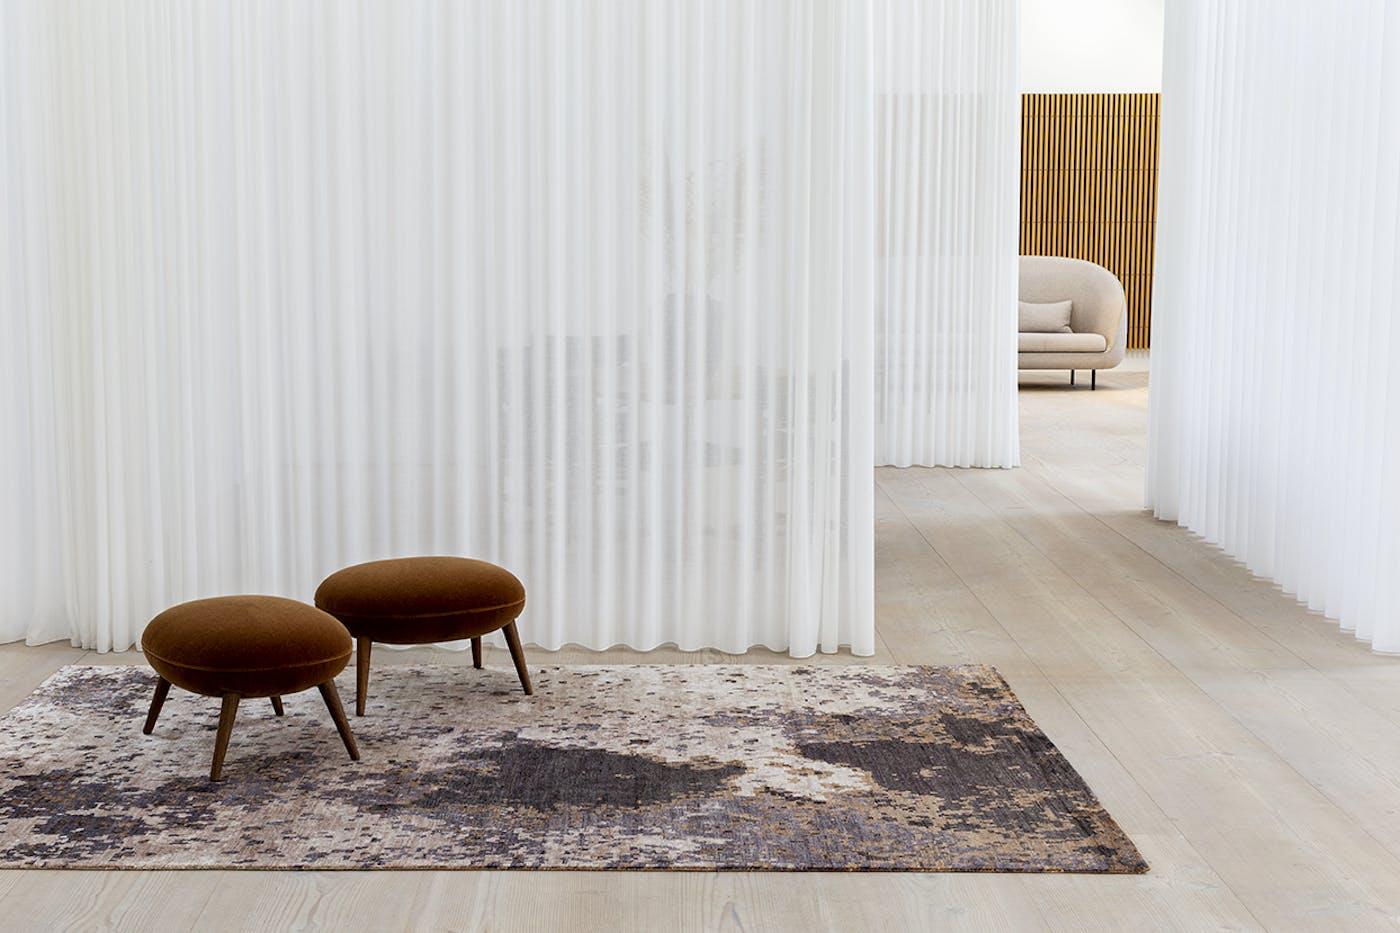 Massimocopenhagen Copper Moon bamboo environment lowres